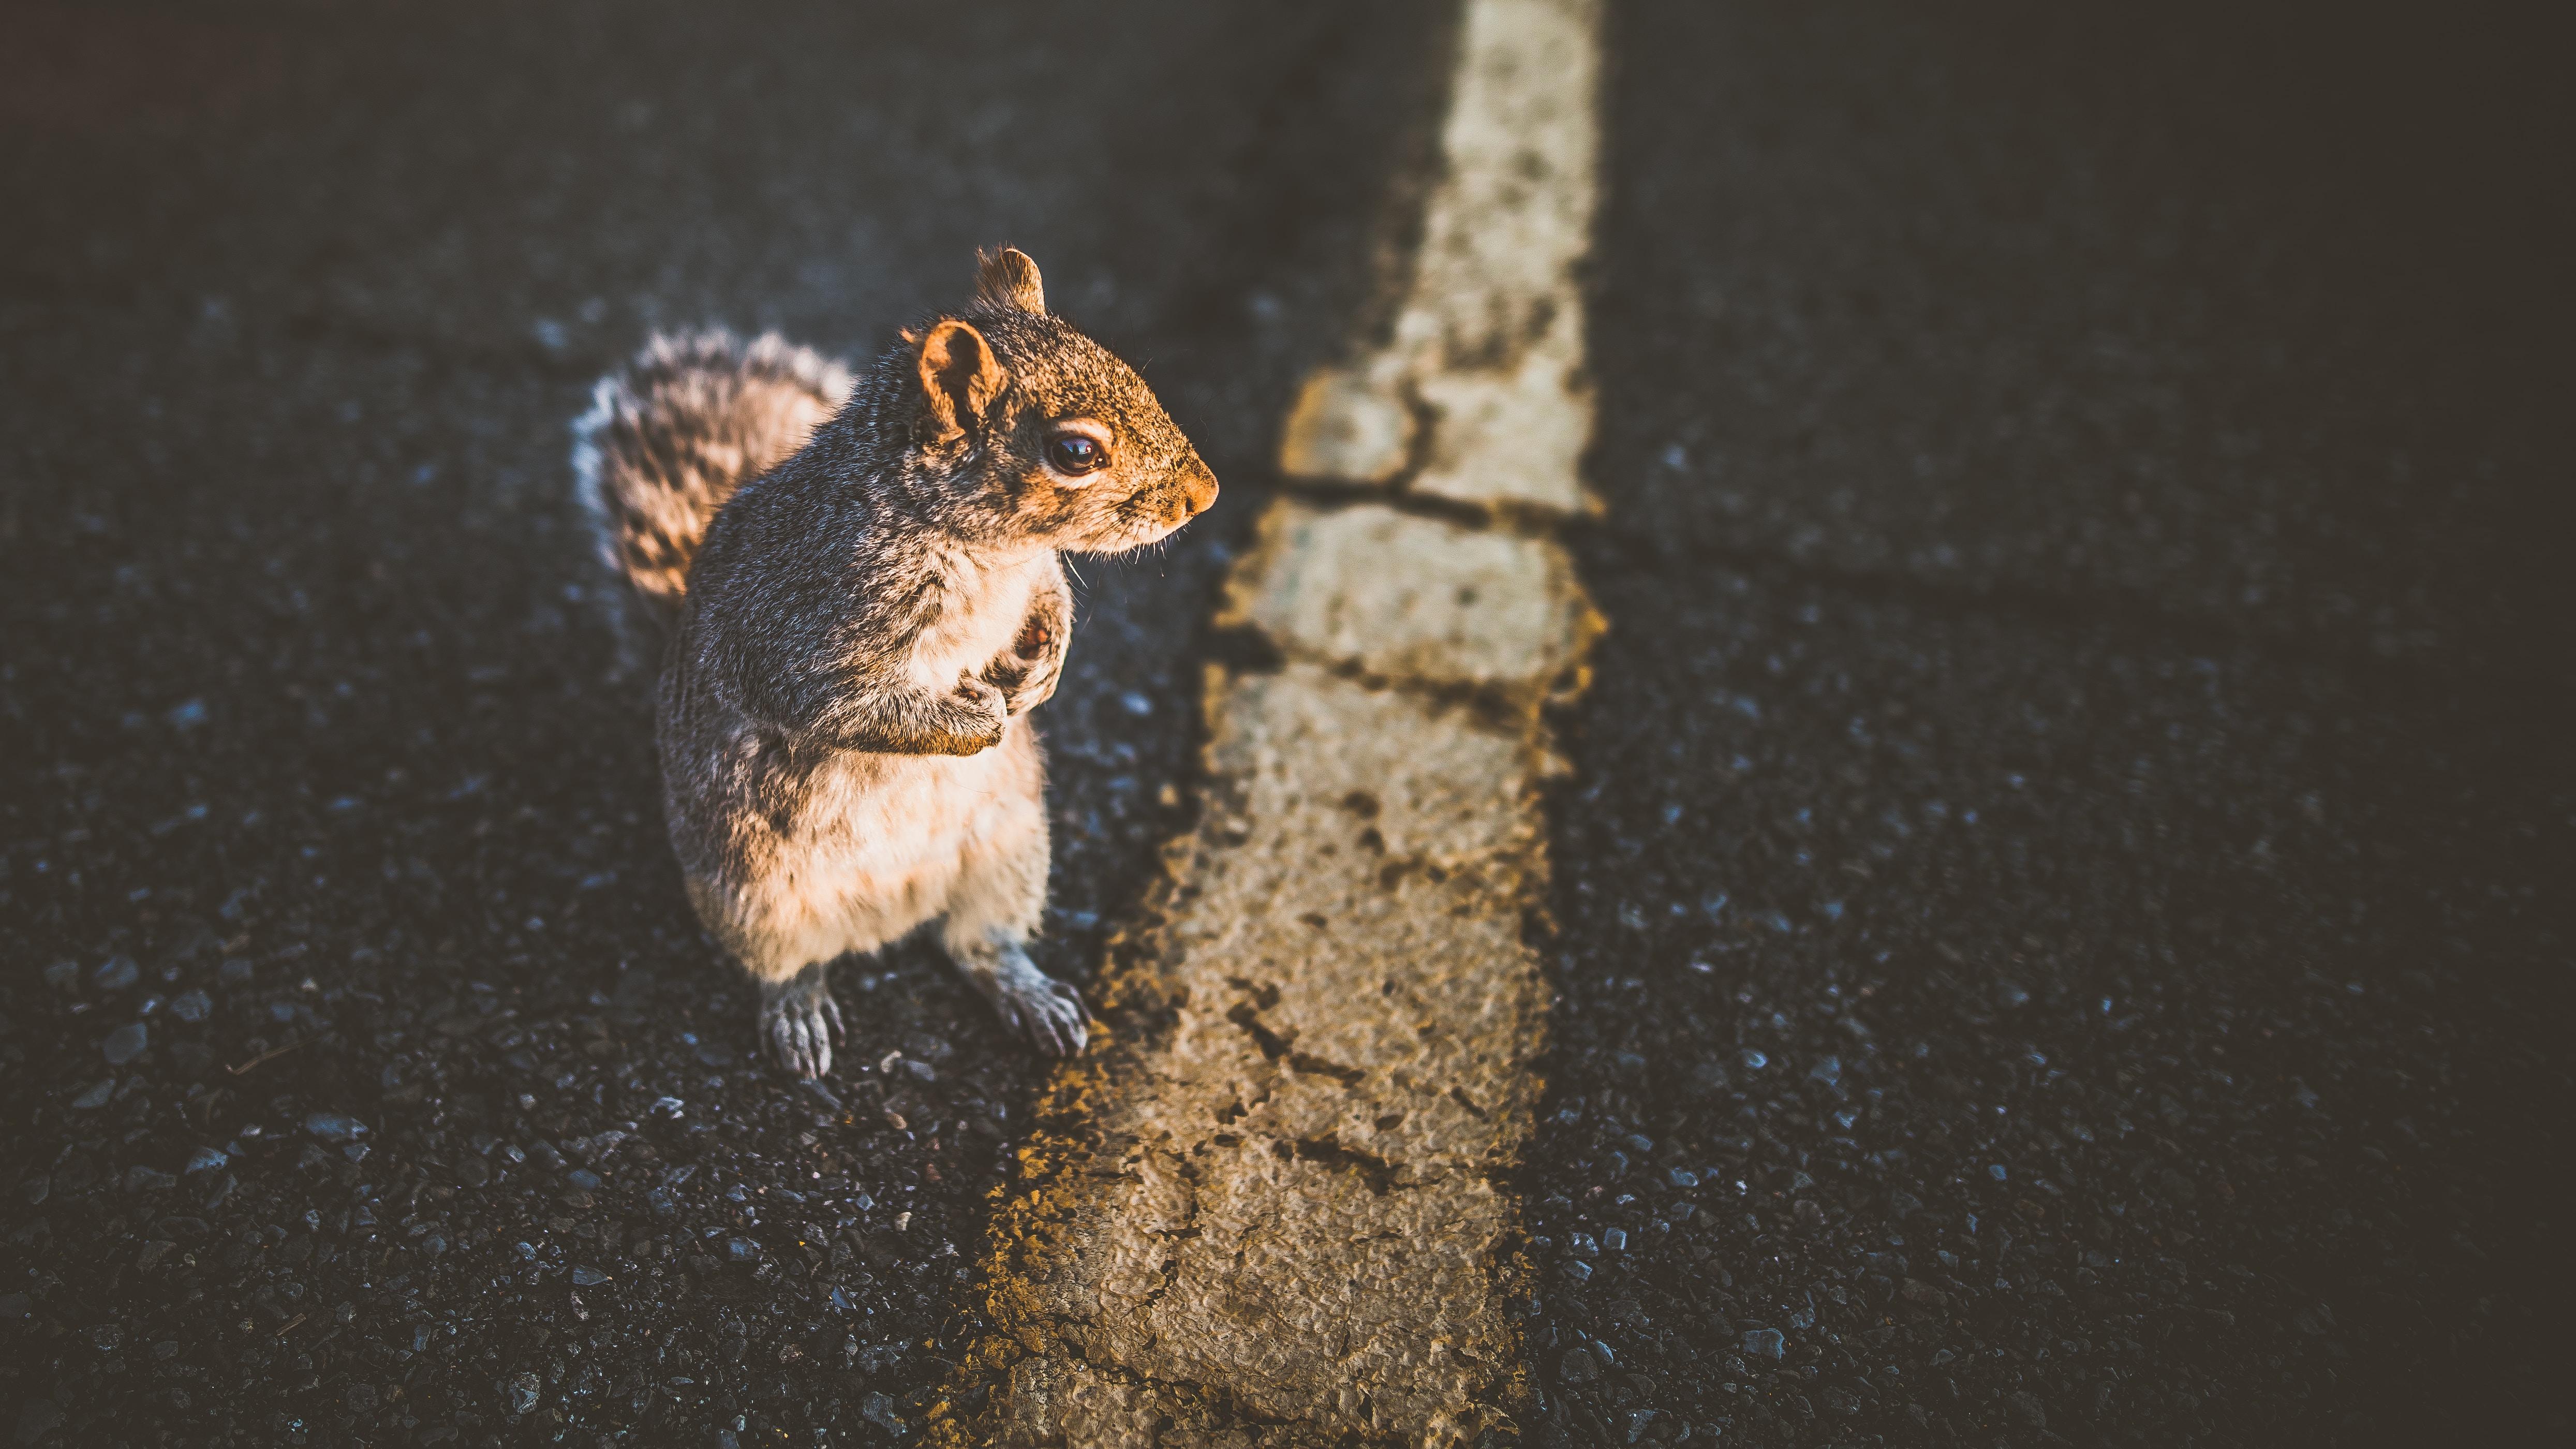 closeup photo of brown squirrel